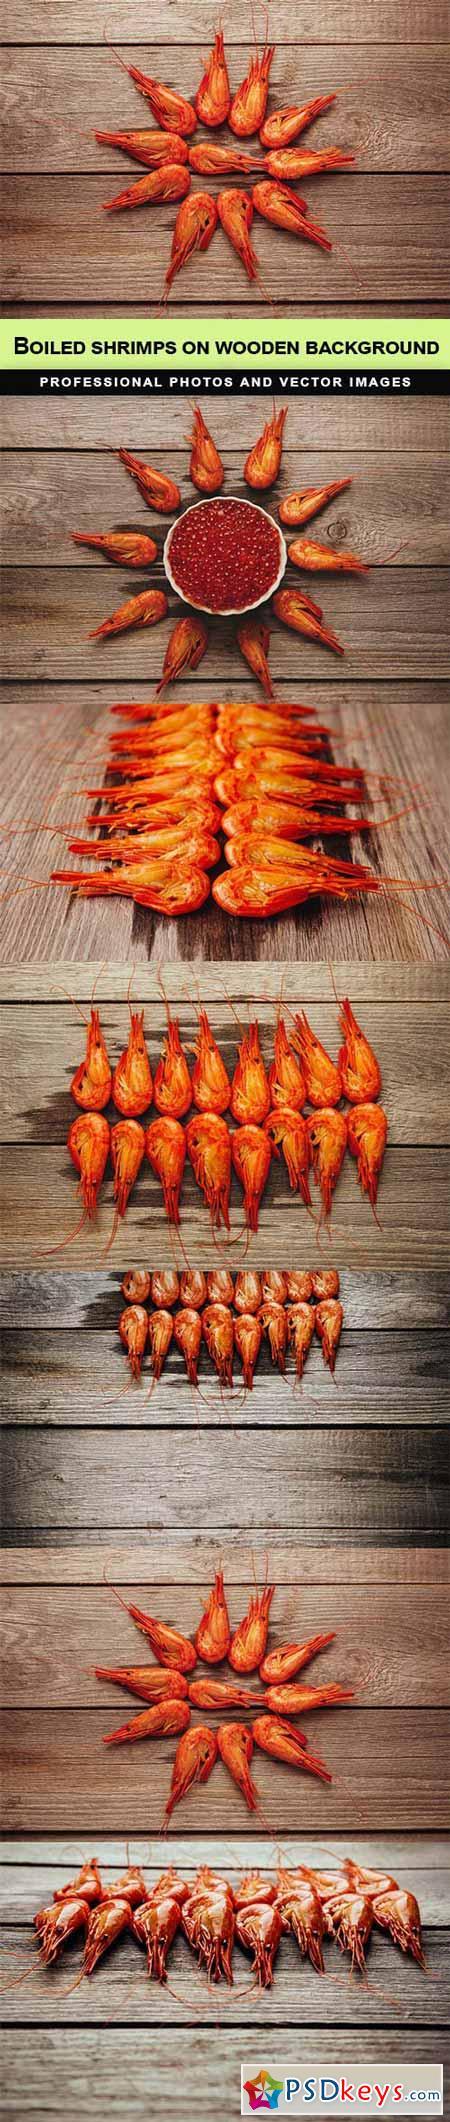 Boiled shrimps on wooden background - 6 UHQ JPEG